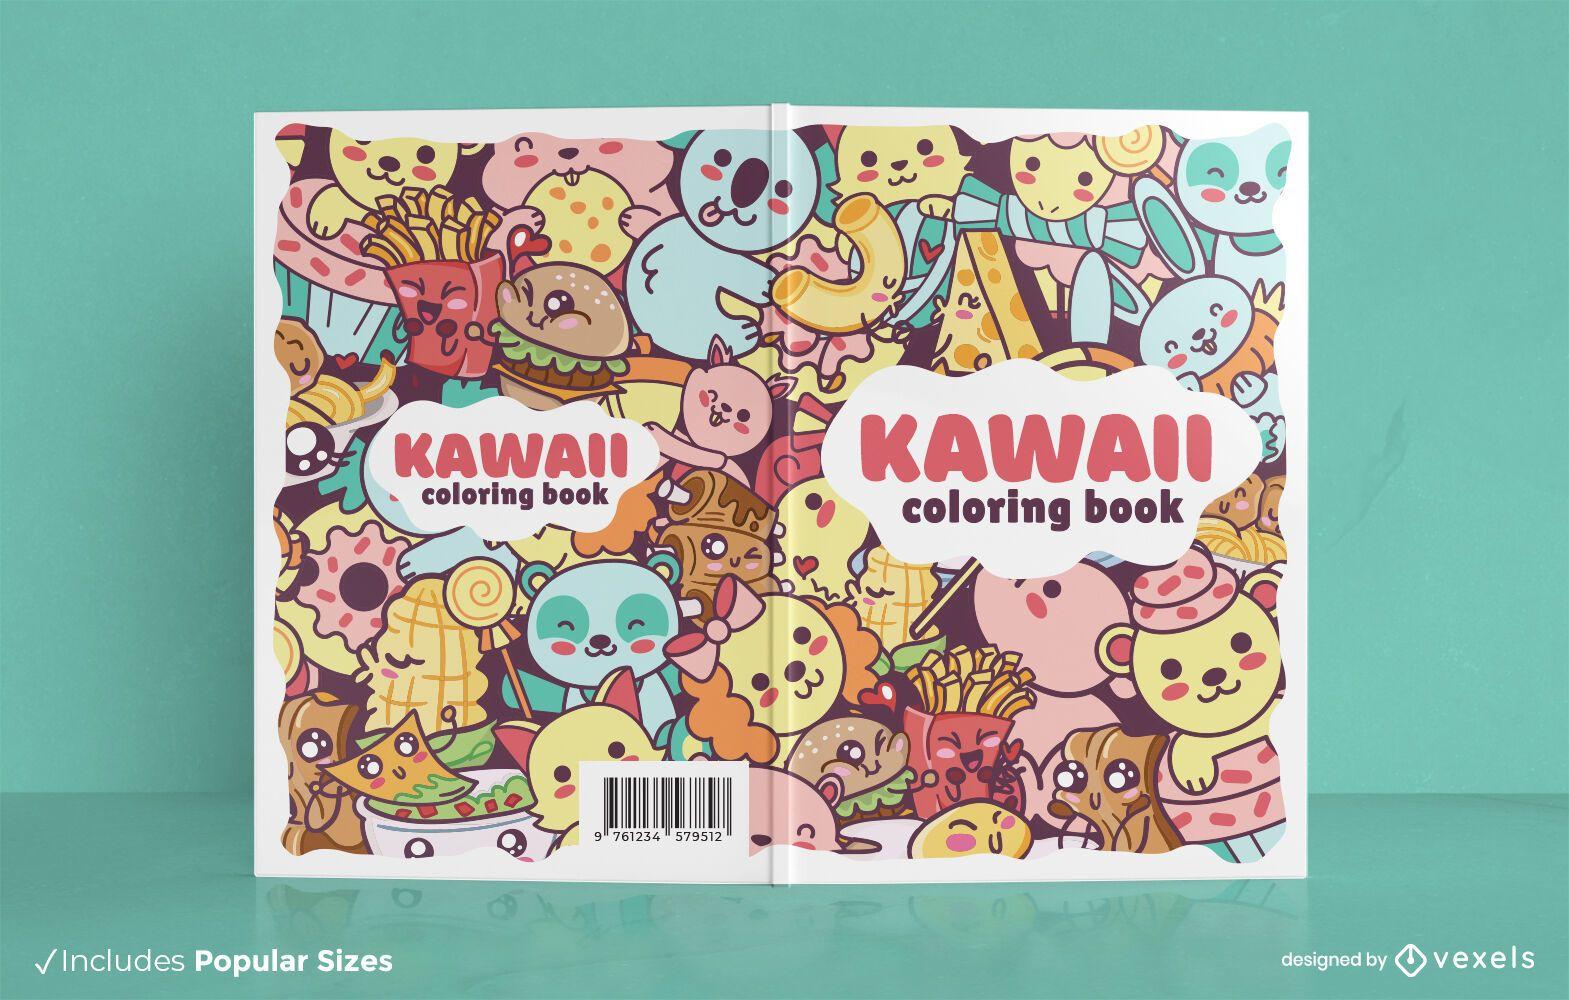 Kawaii coloring book cover design